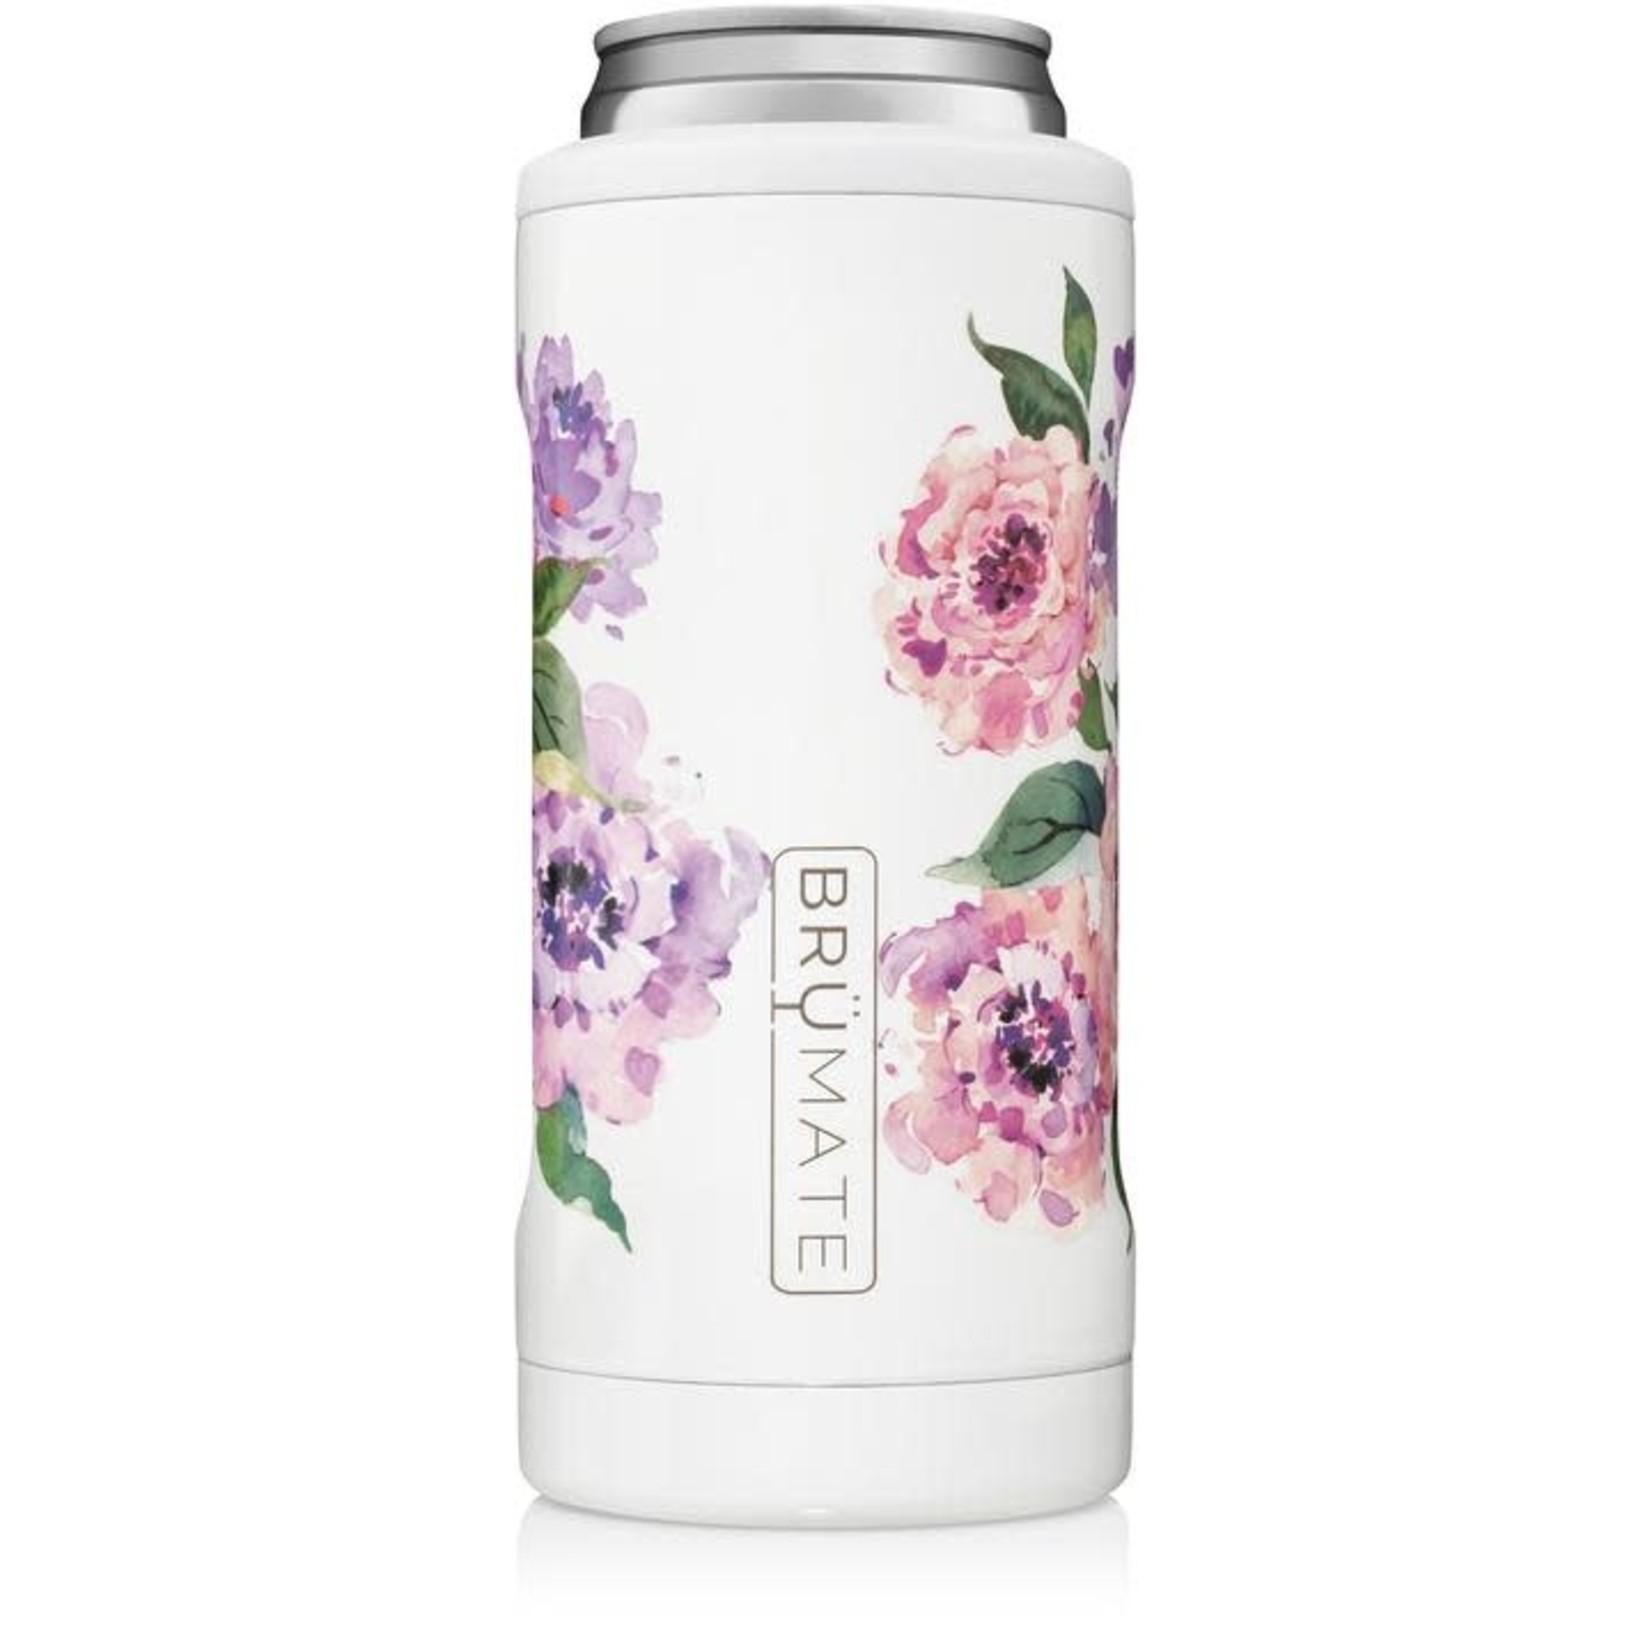 BrüMate Hopsulator Slim - Limited Edition